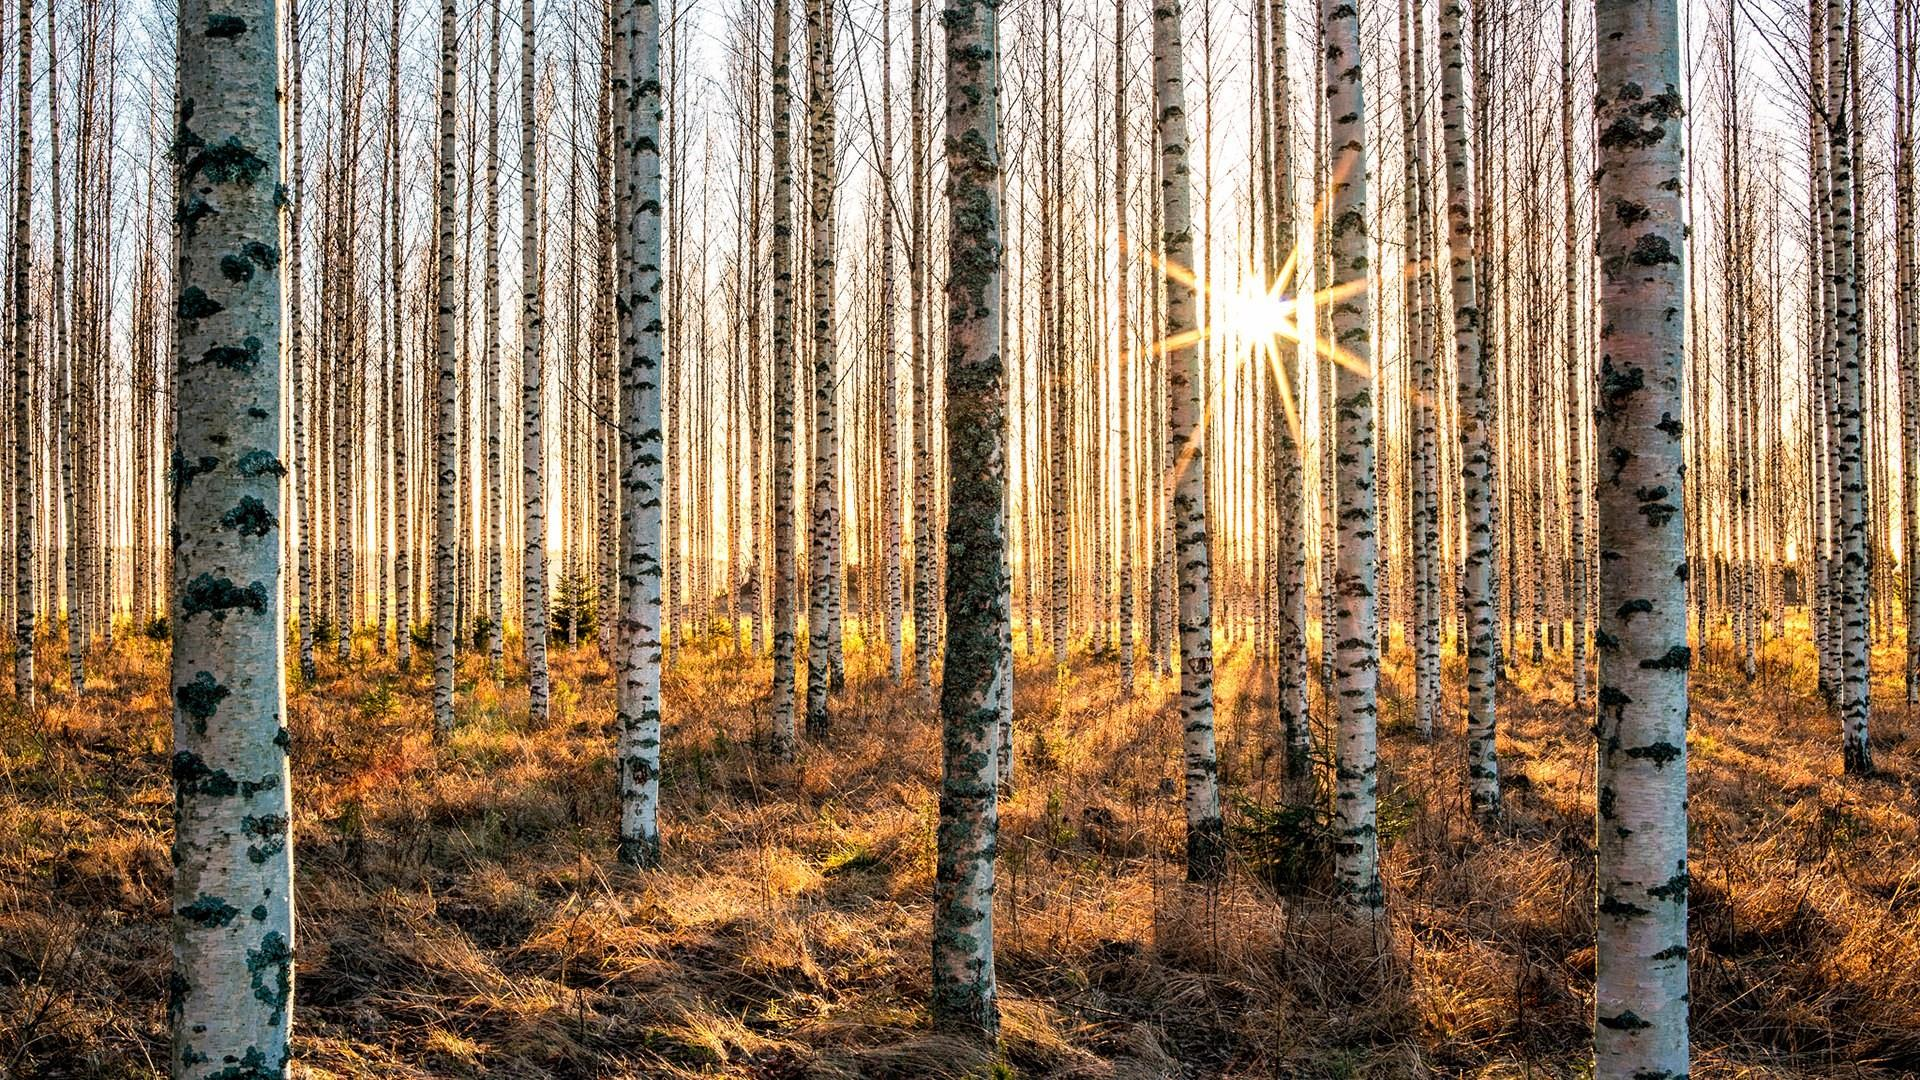 Free Photo Birch Forest Birch Lush Wood Free